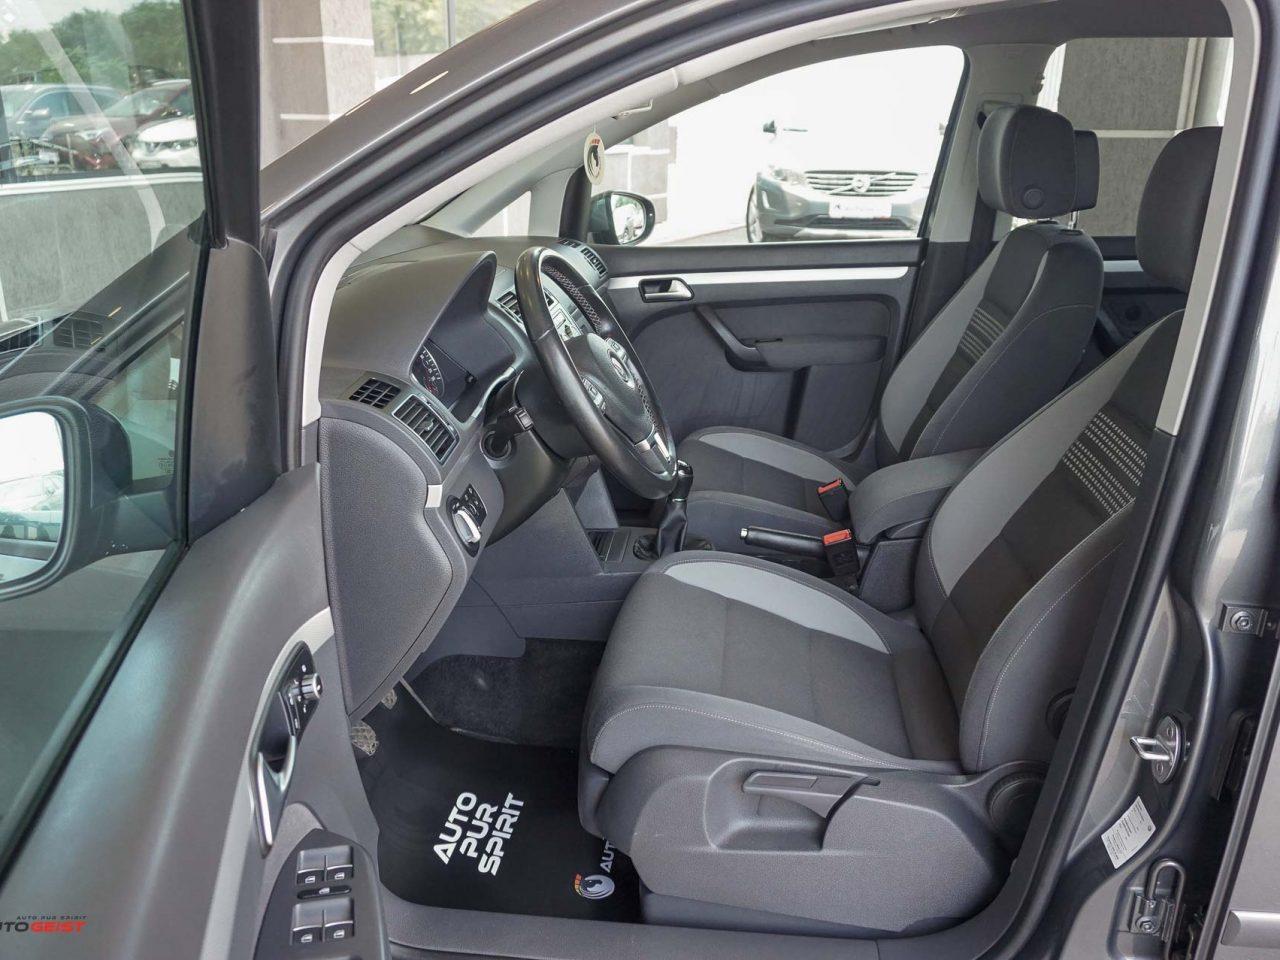 661-volkswagen-touran-gri-manual-01833